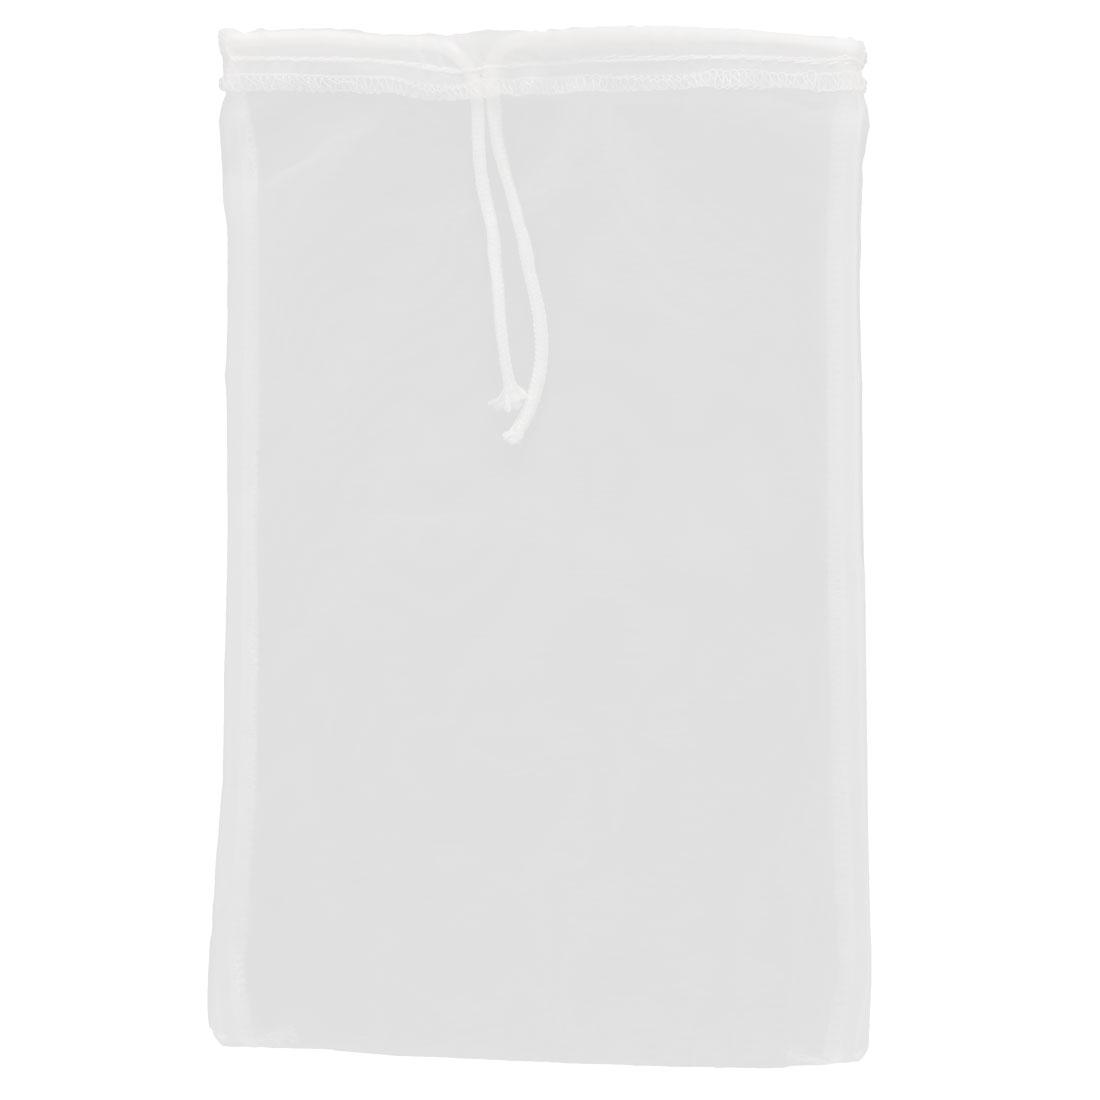 Home Kitchen Coffee Spices Soybean Milk Food Filter Bag White 31cm x 19cm